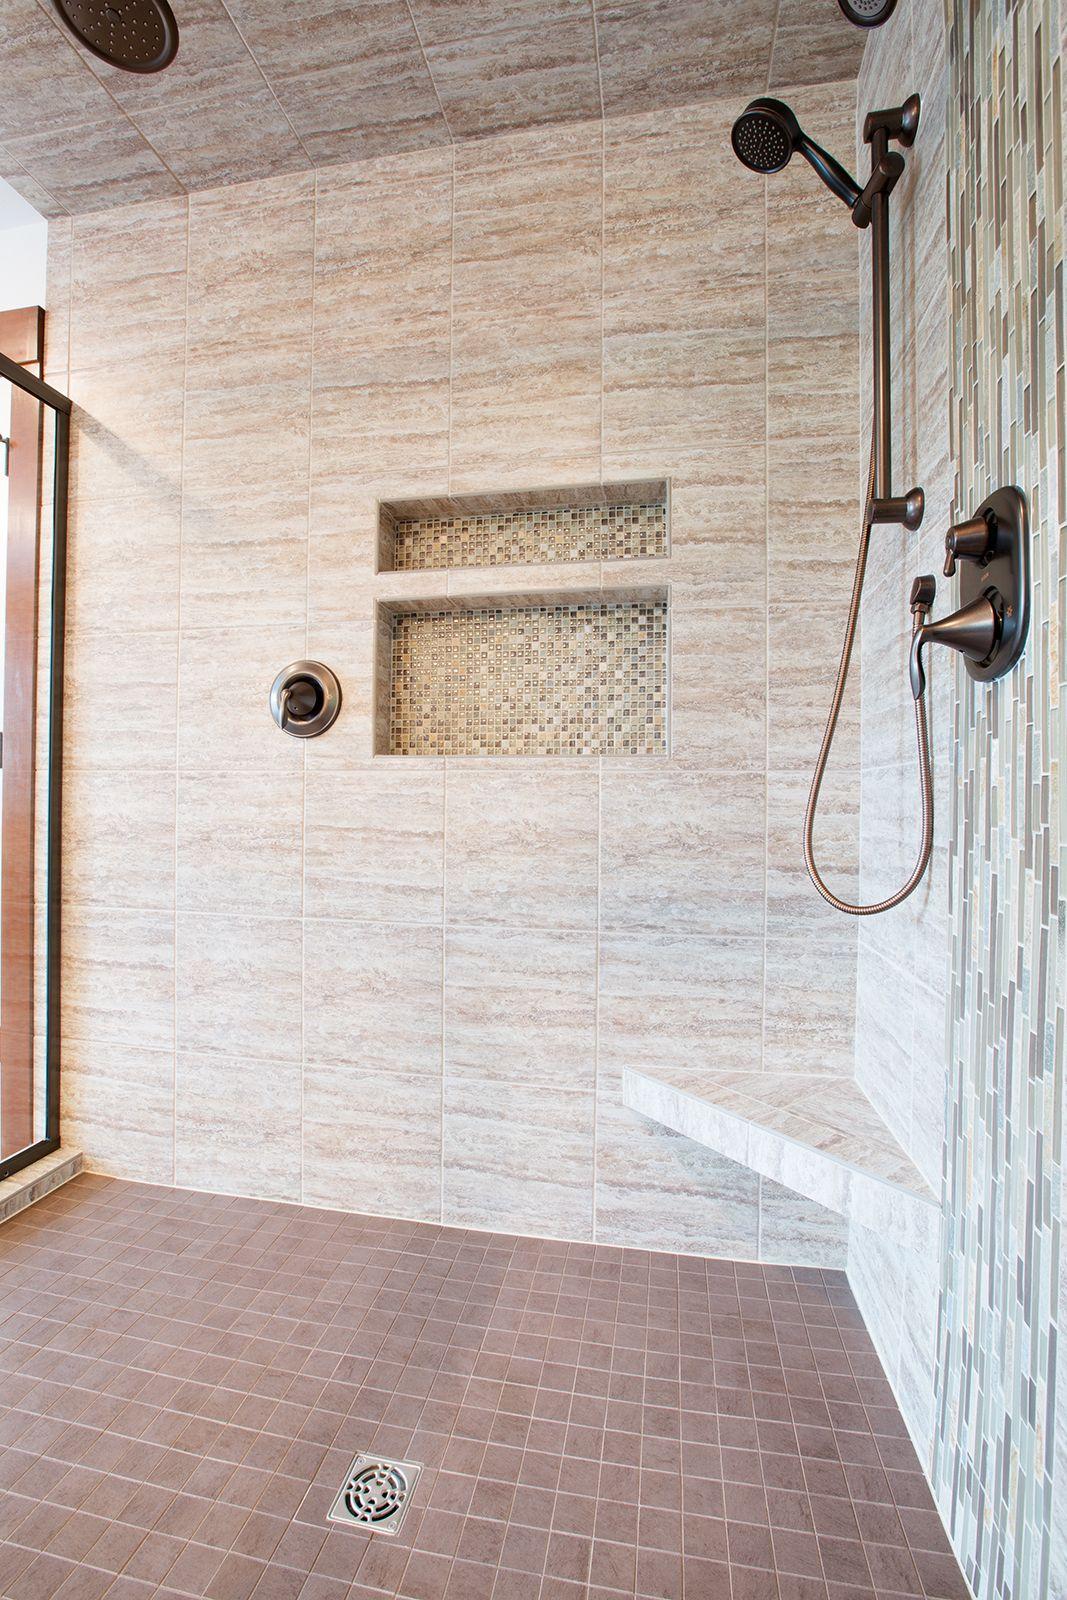 Beautiful fully tiled shower, walls, floor & ceiling. Moen ORB rain shower head and hand held shower head. Built in tile bench and shampoo shelf.